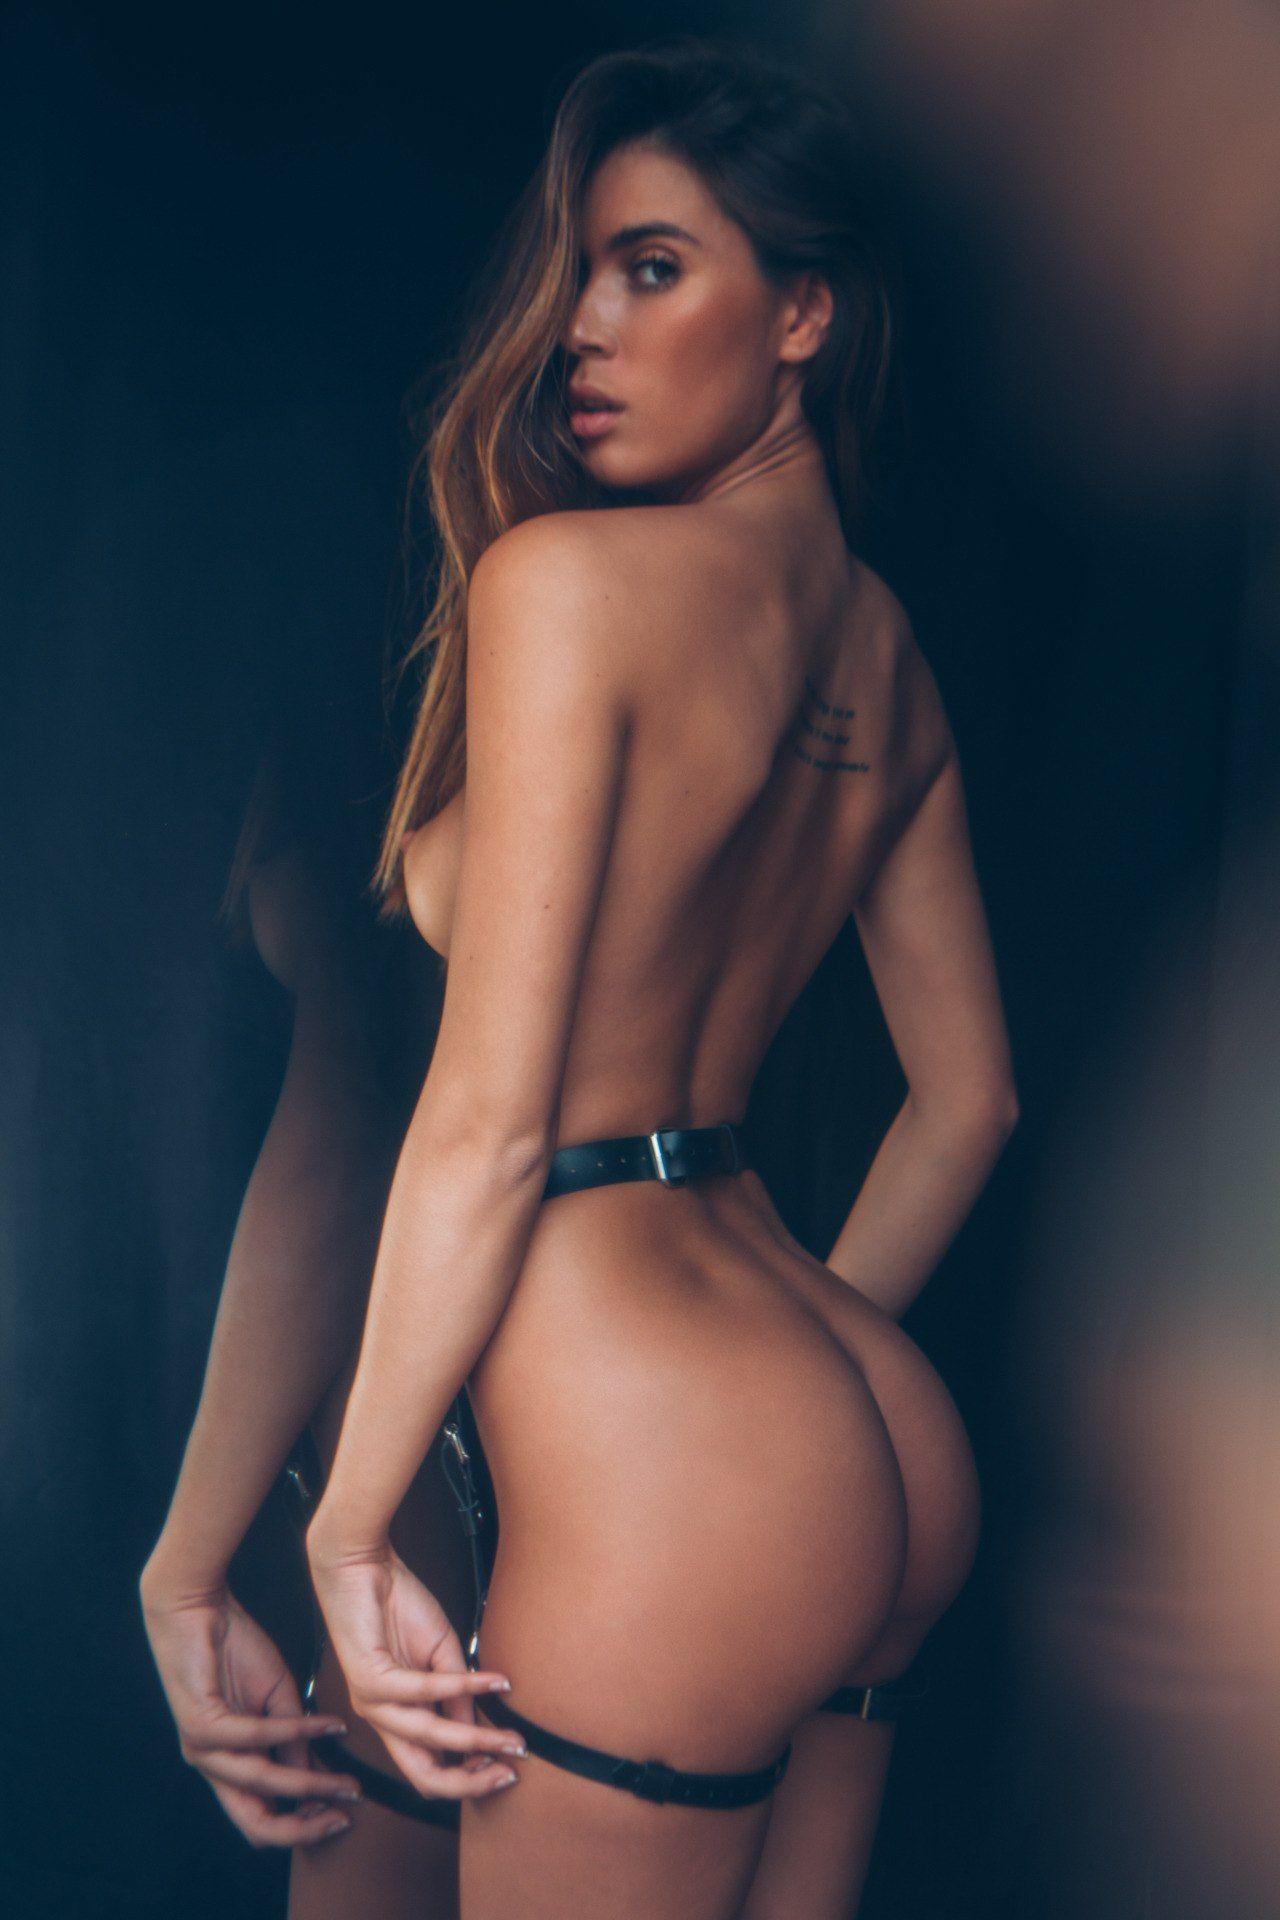 ca90da3736 Angela Rei by Nicolas Larriere French Models